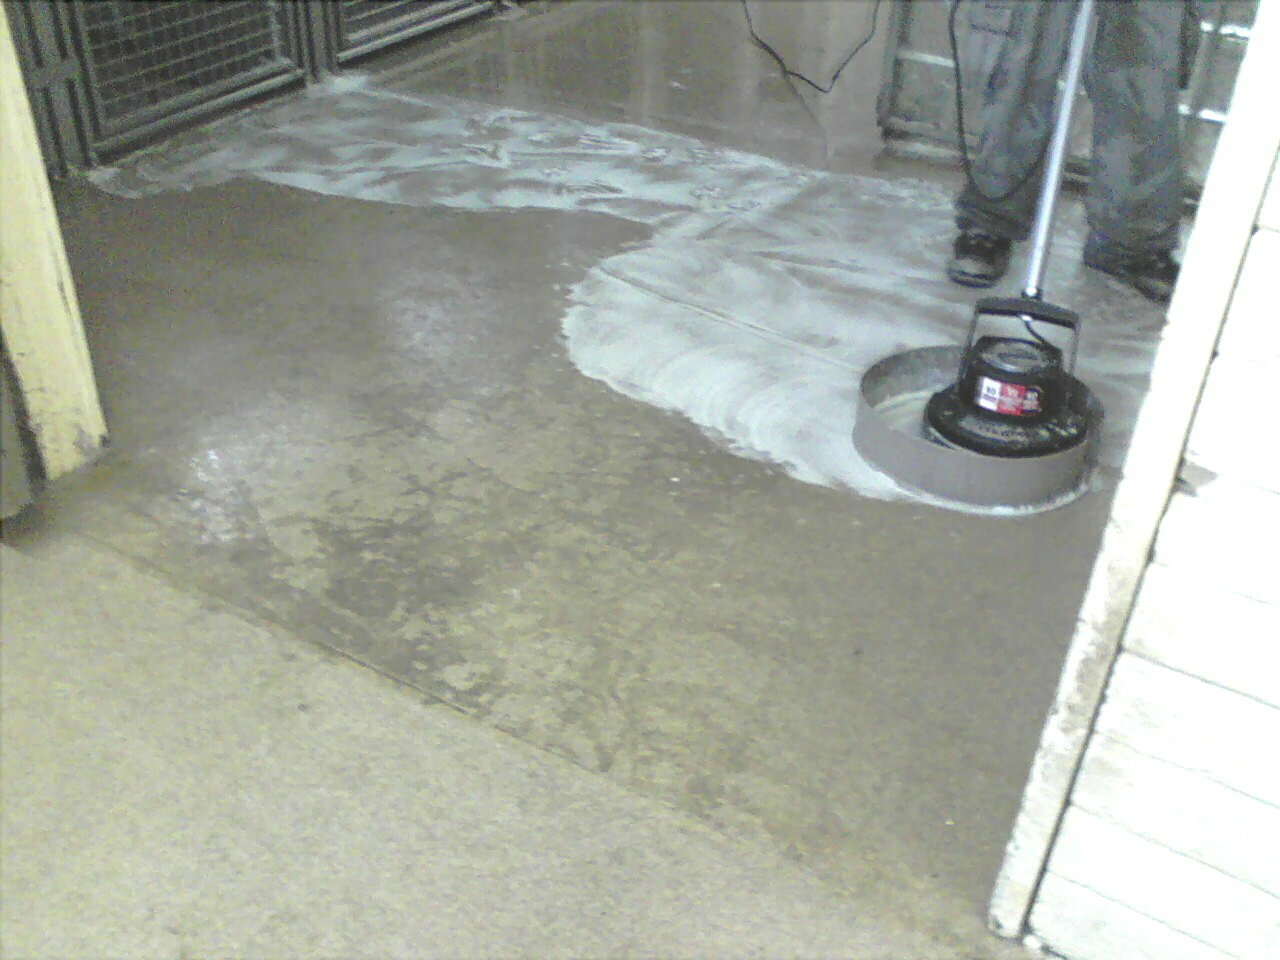 Scrubbing a Kennel floor using SealGreen Kennel cleaner